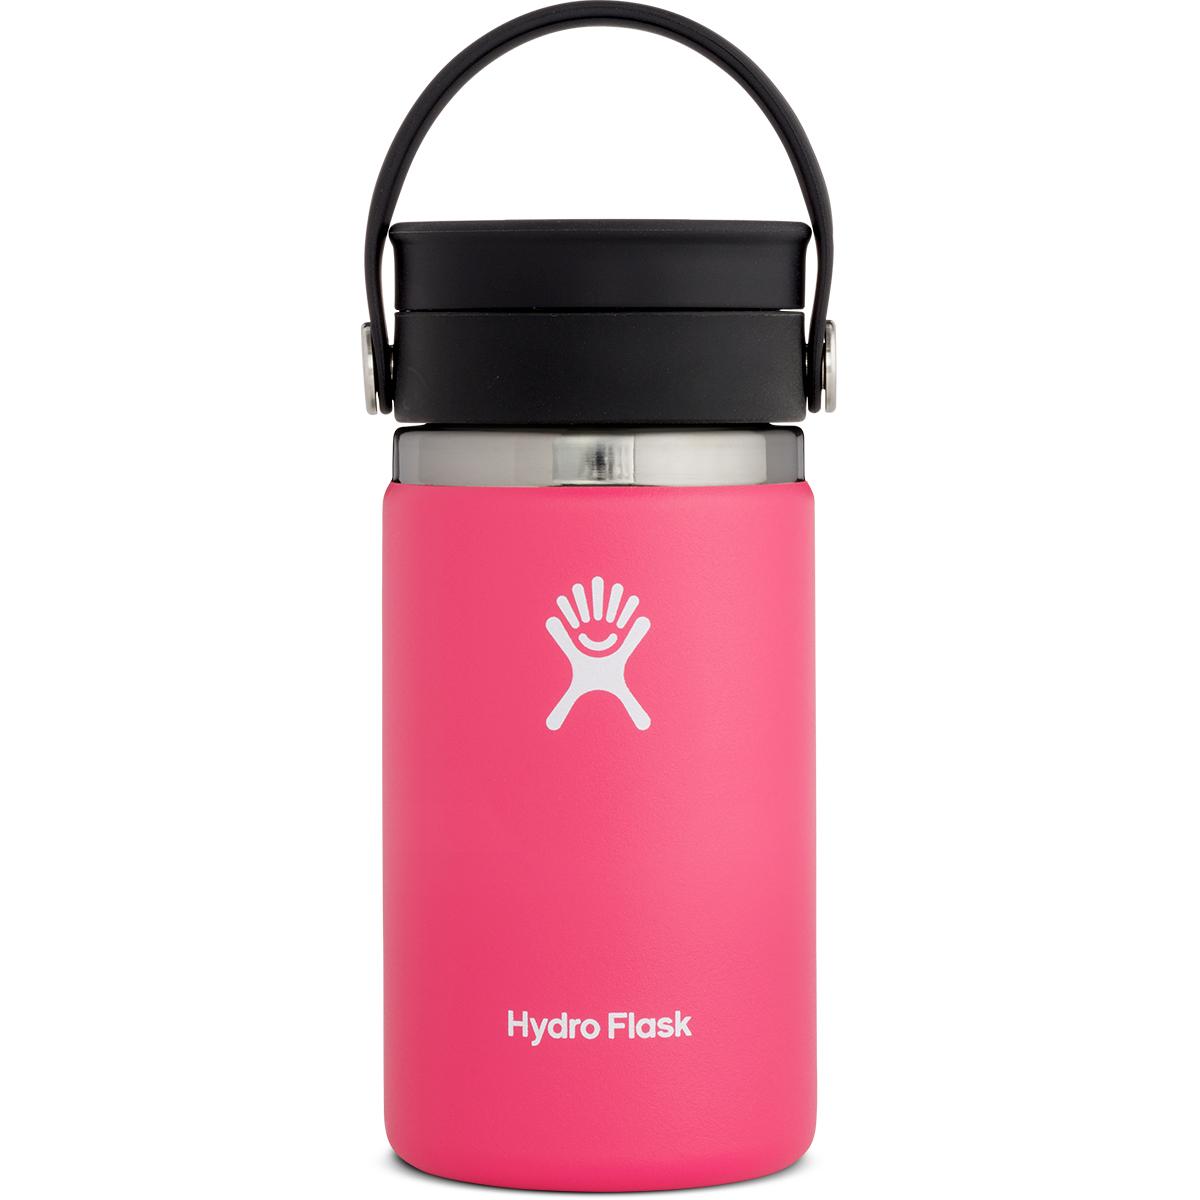 Hydroflask 12 Oz. Coffee Flask